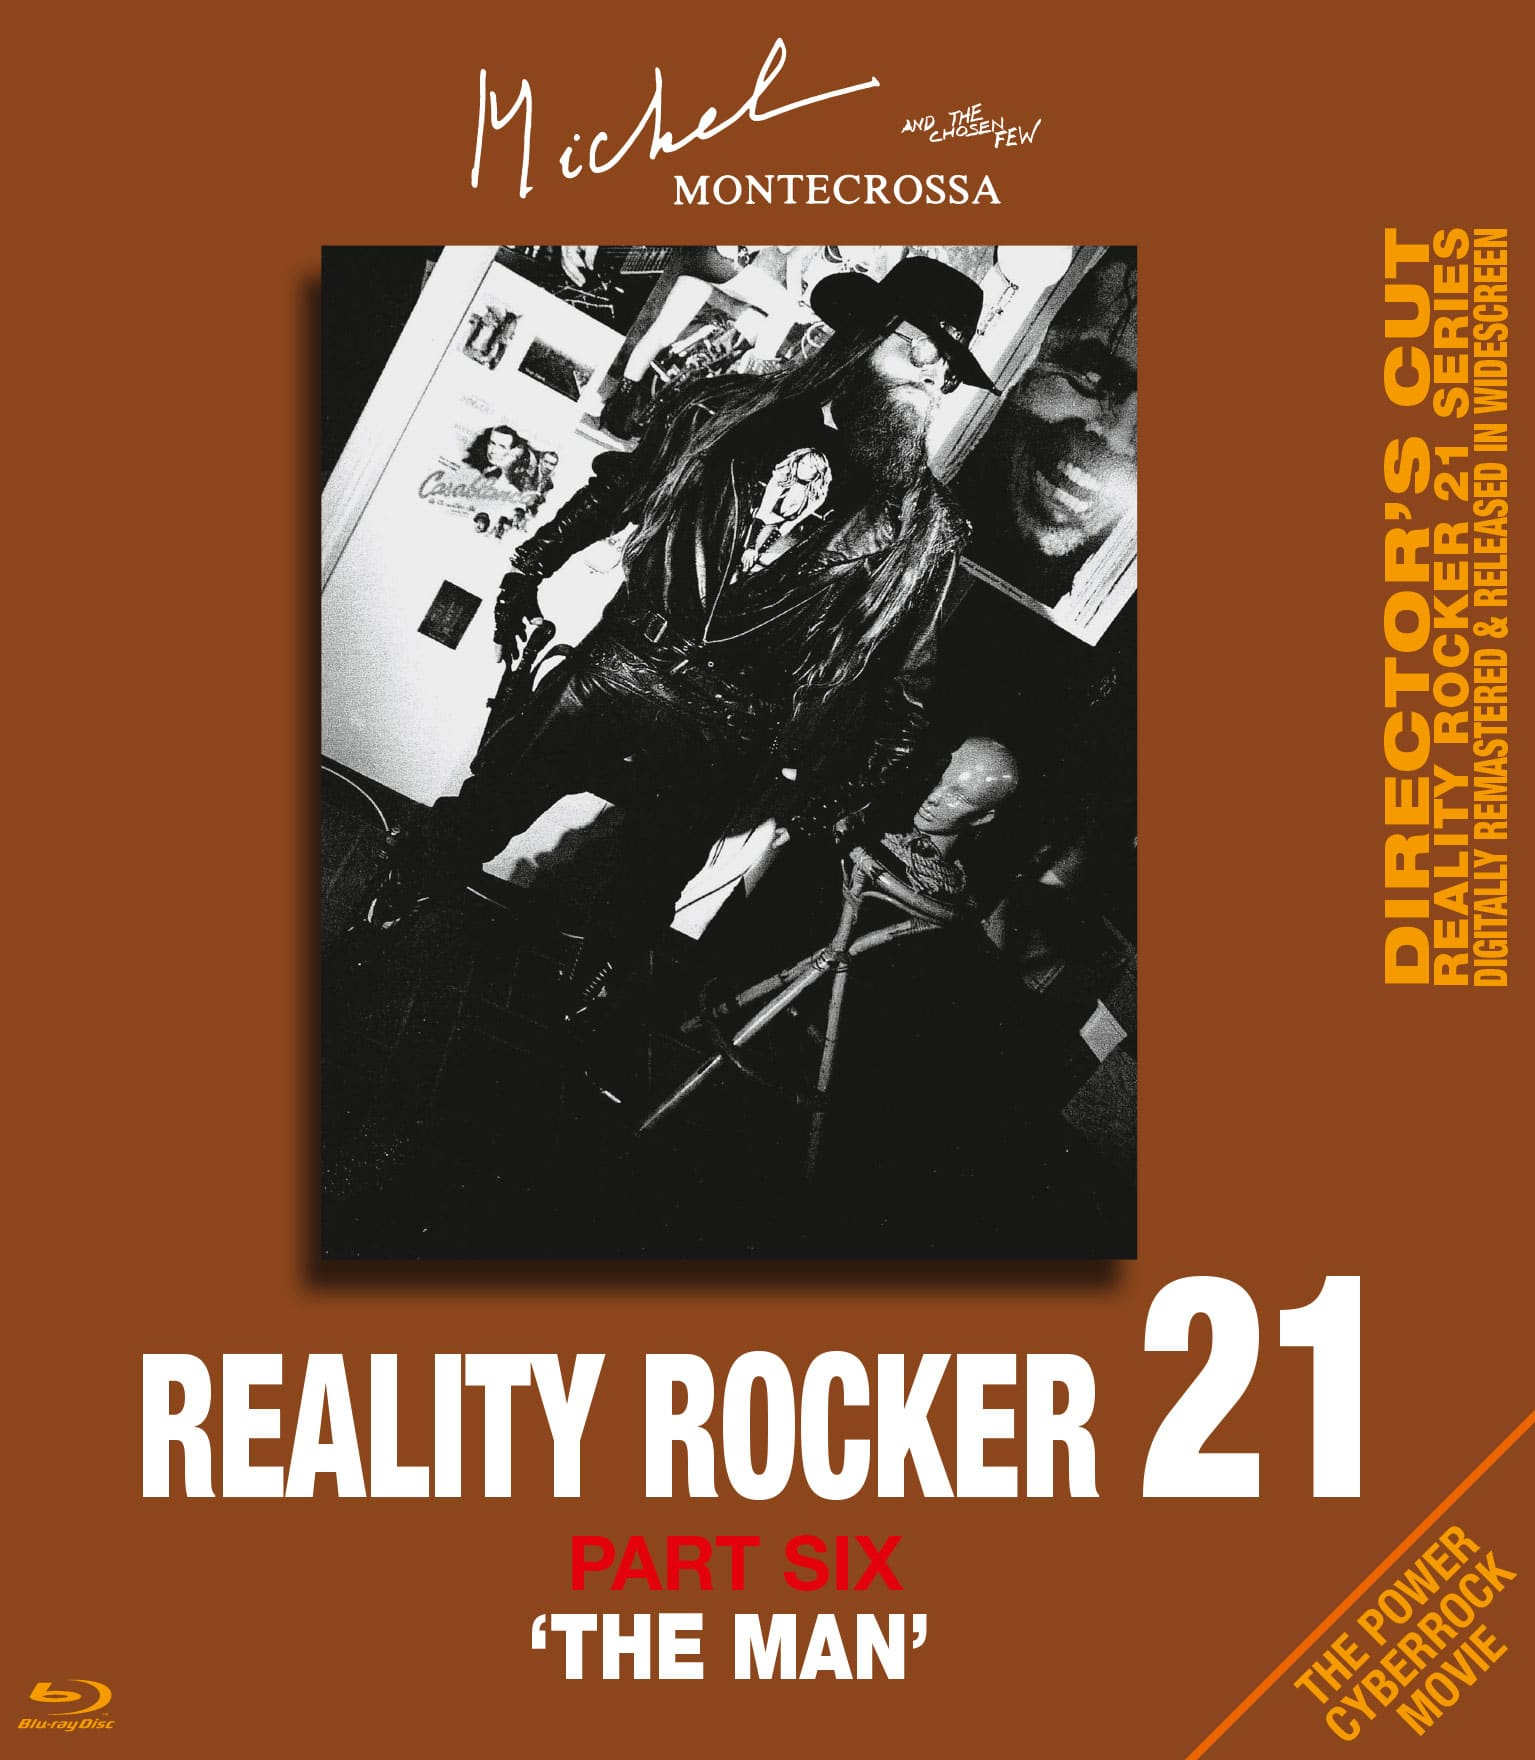 Reality Rocker, Part Six: The Man